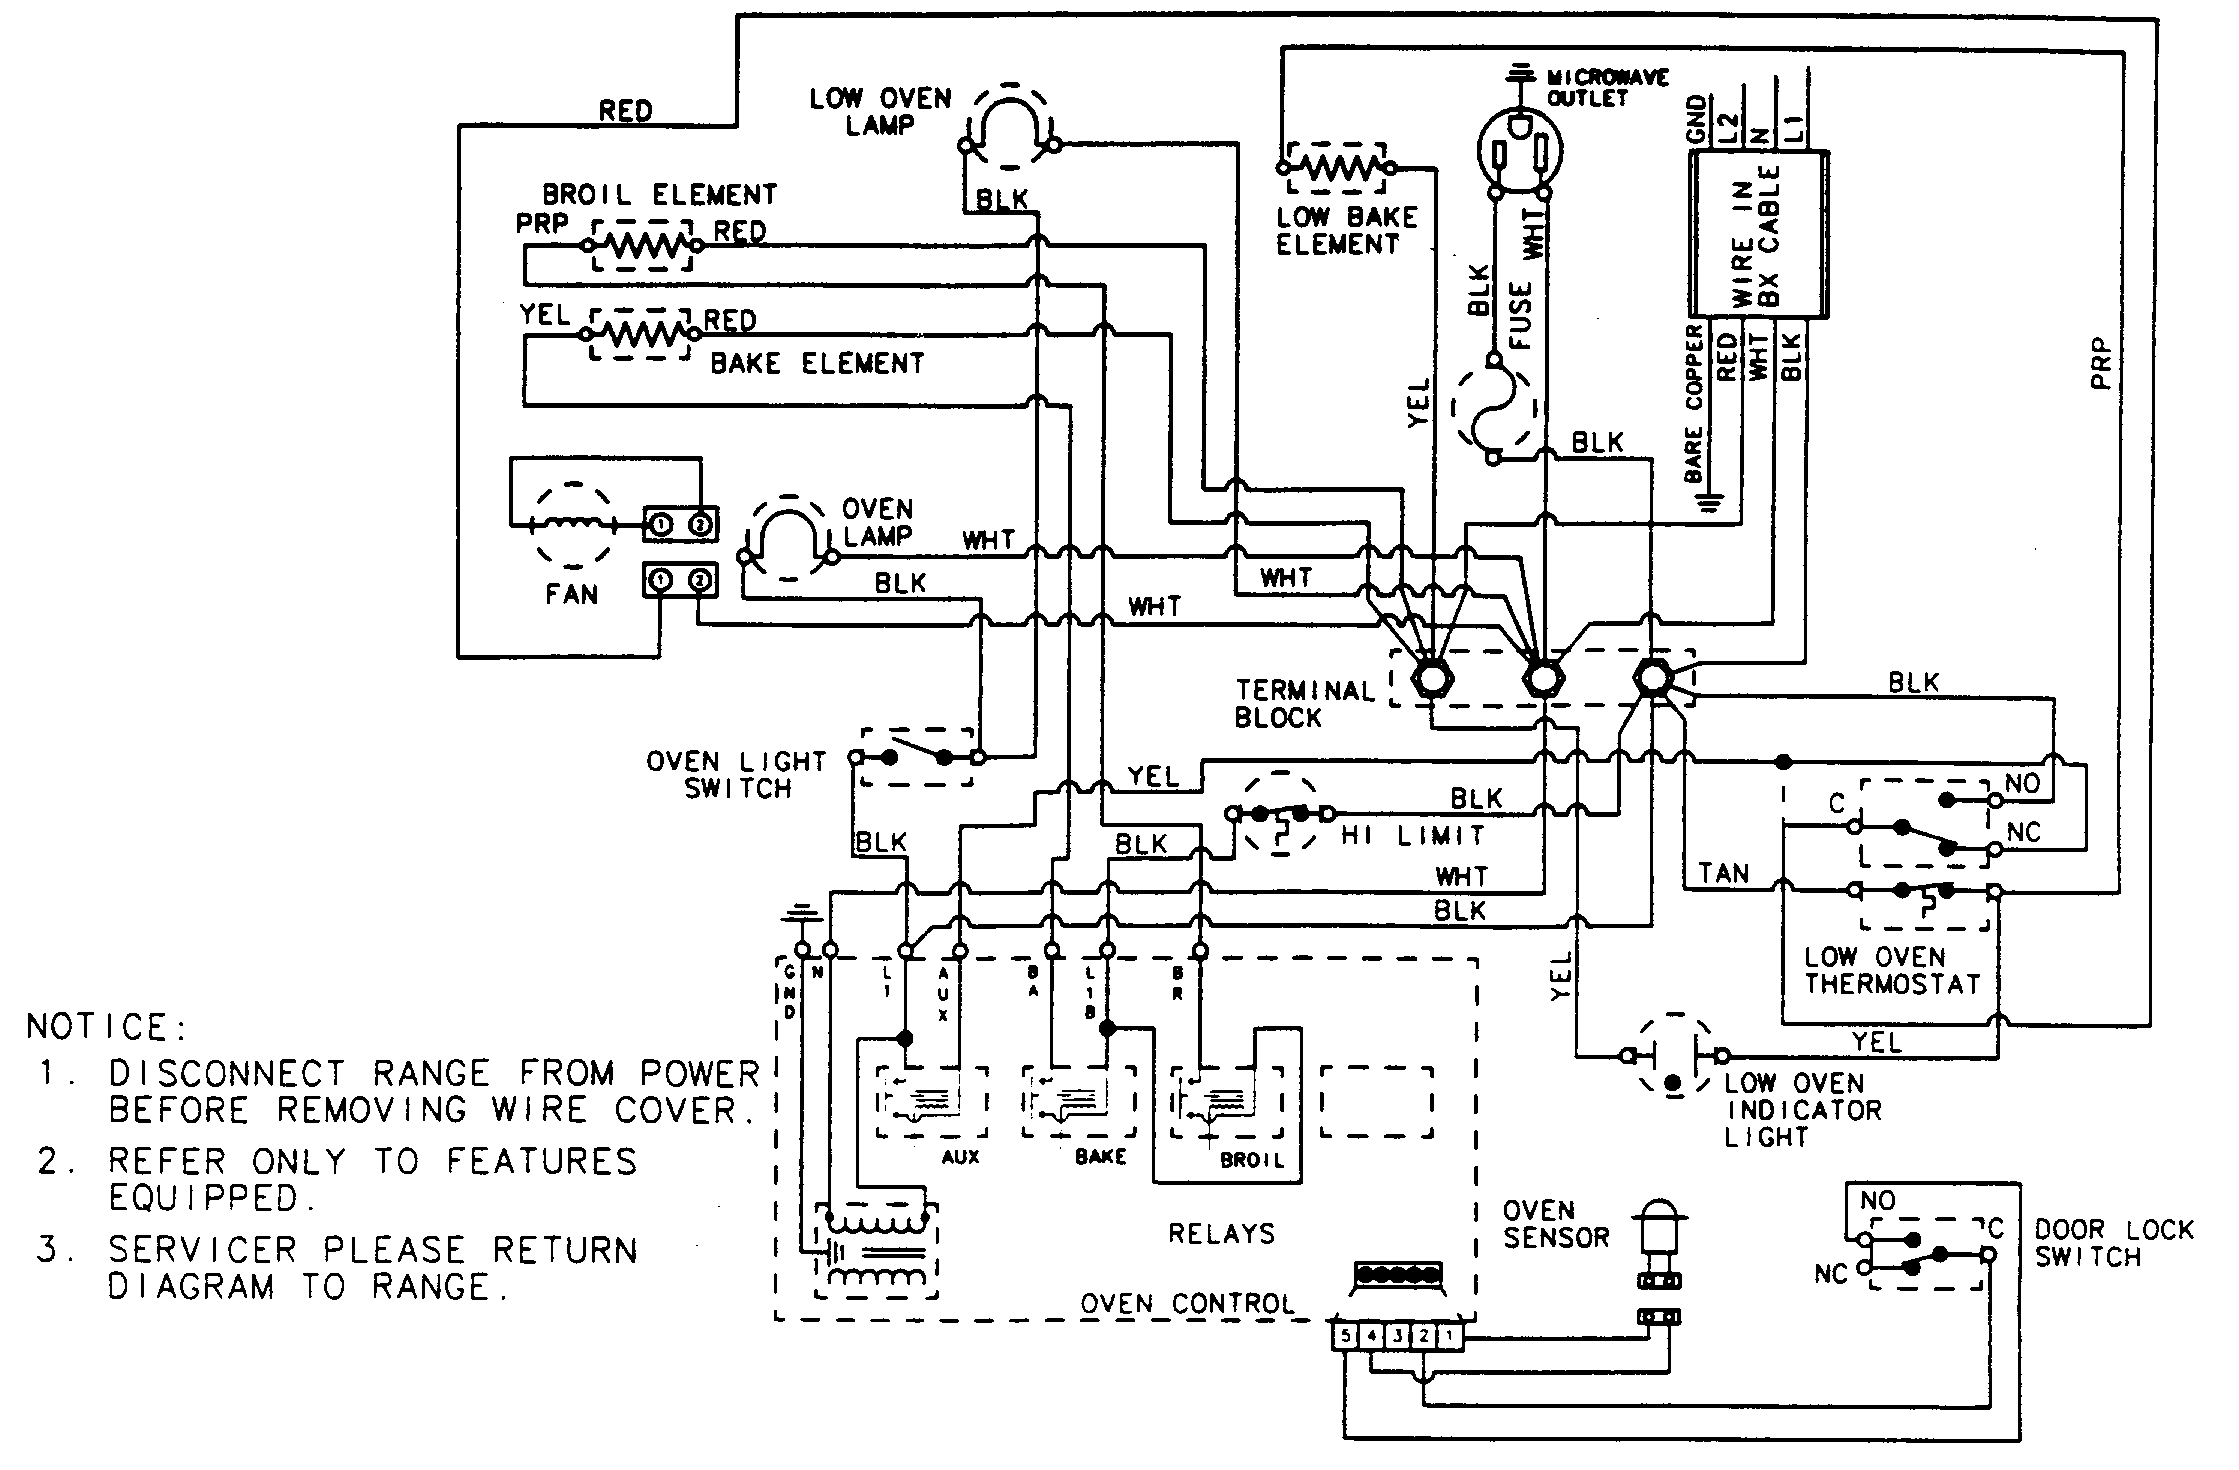 Ge Gas Range Wiring Schematic Diagram Audi A4 Headlamp For Stove Burners Schematics Diagramwiring